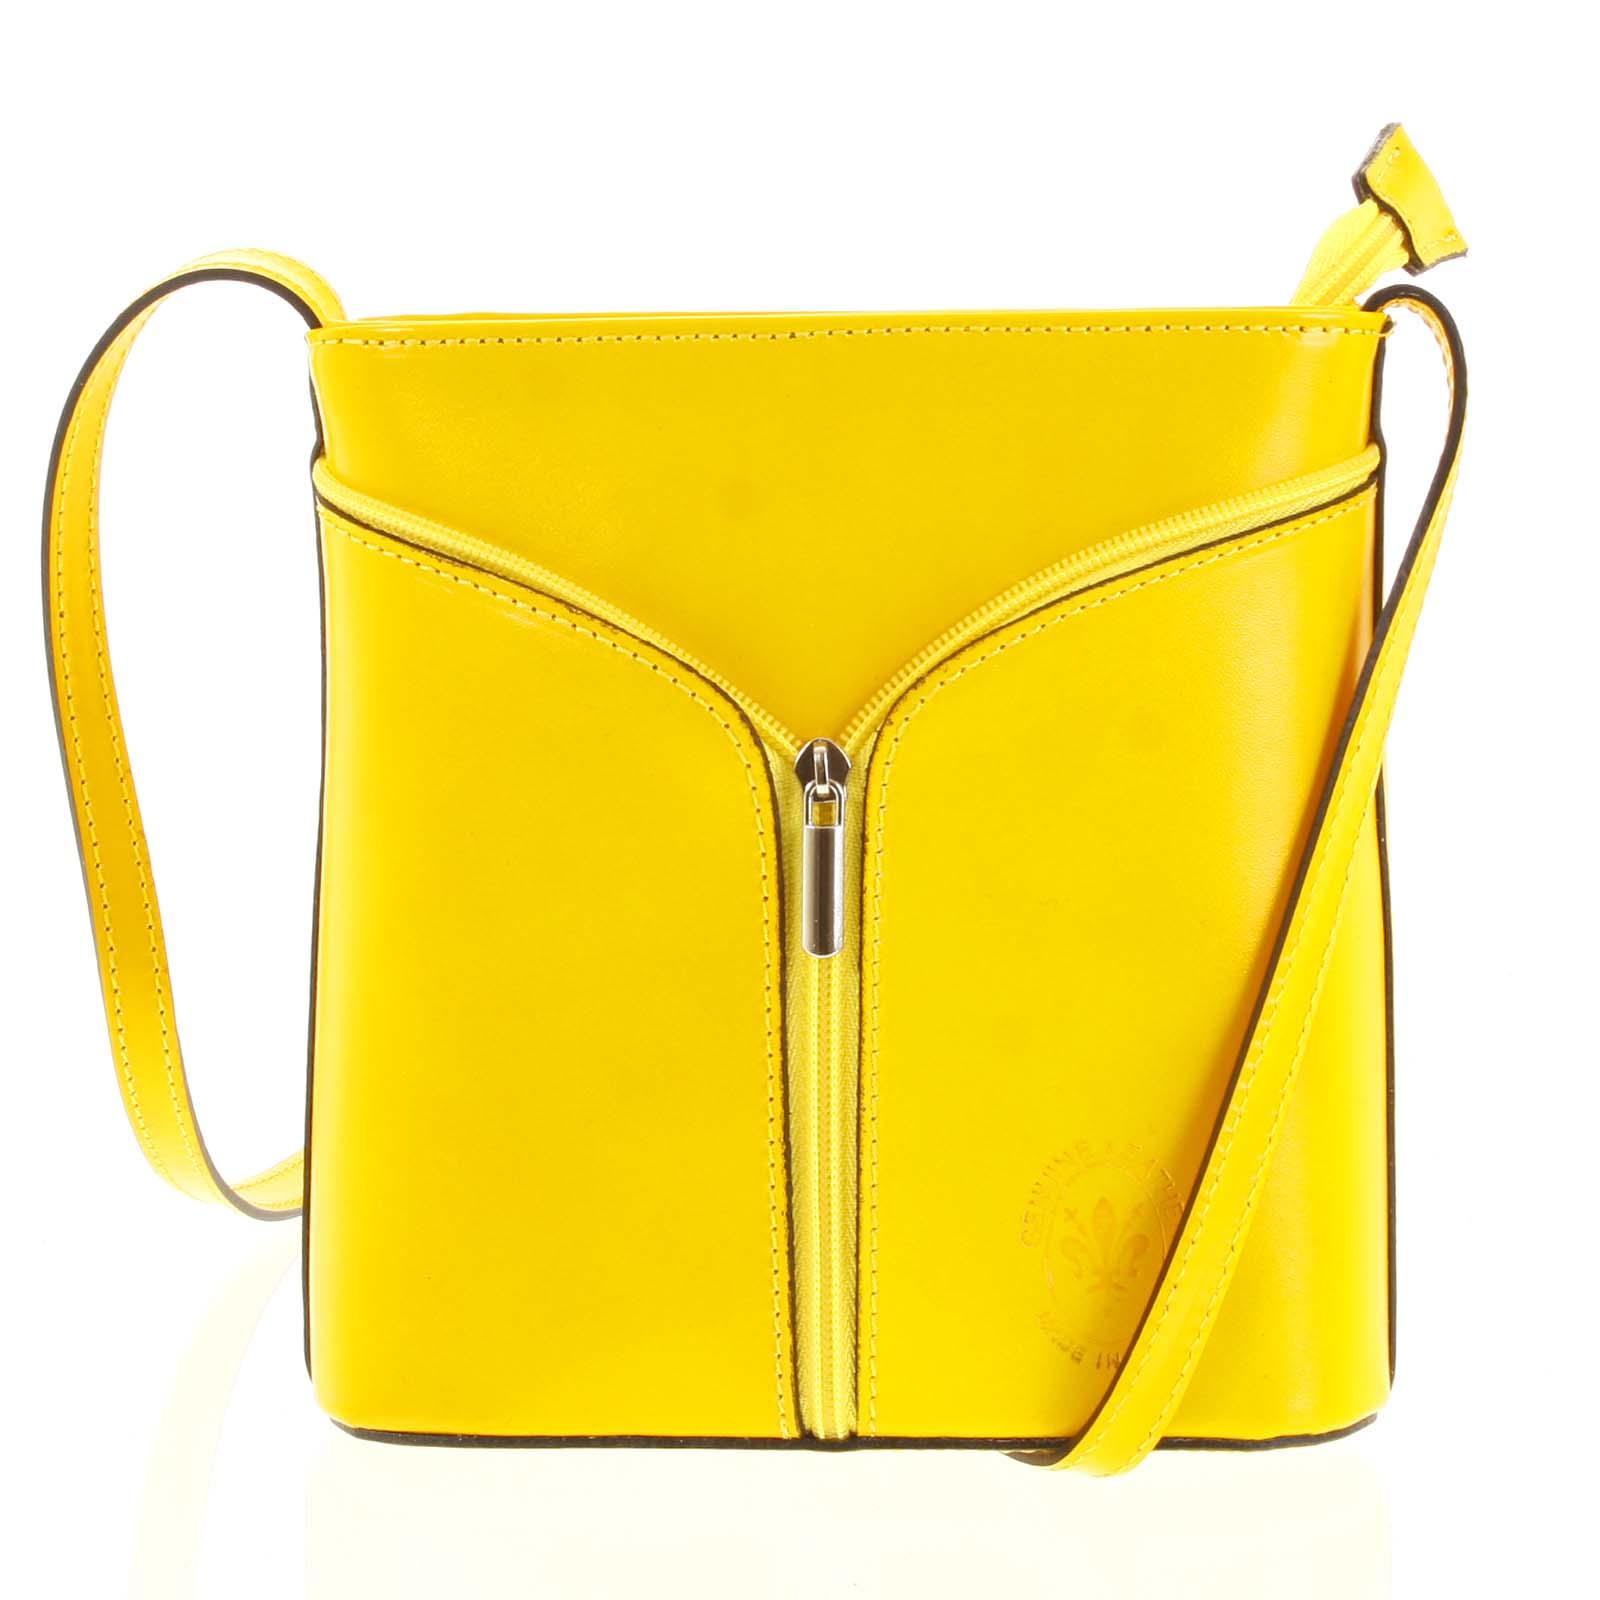 Dámská kožená crossbody kabelka žlutá - ItalY Hallie